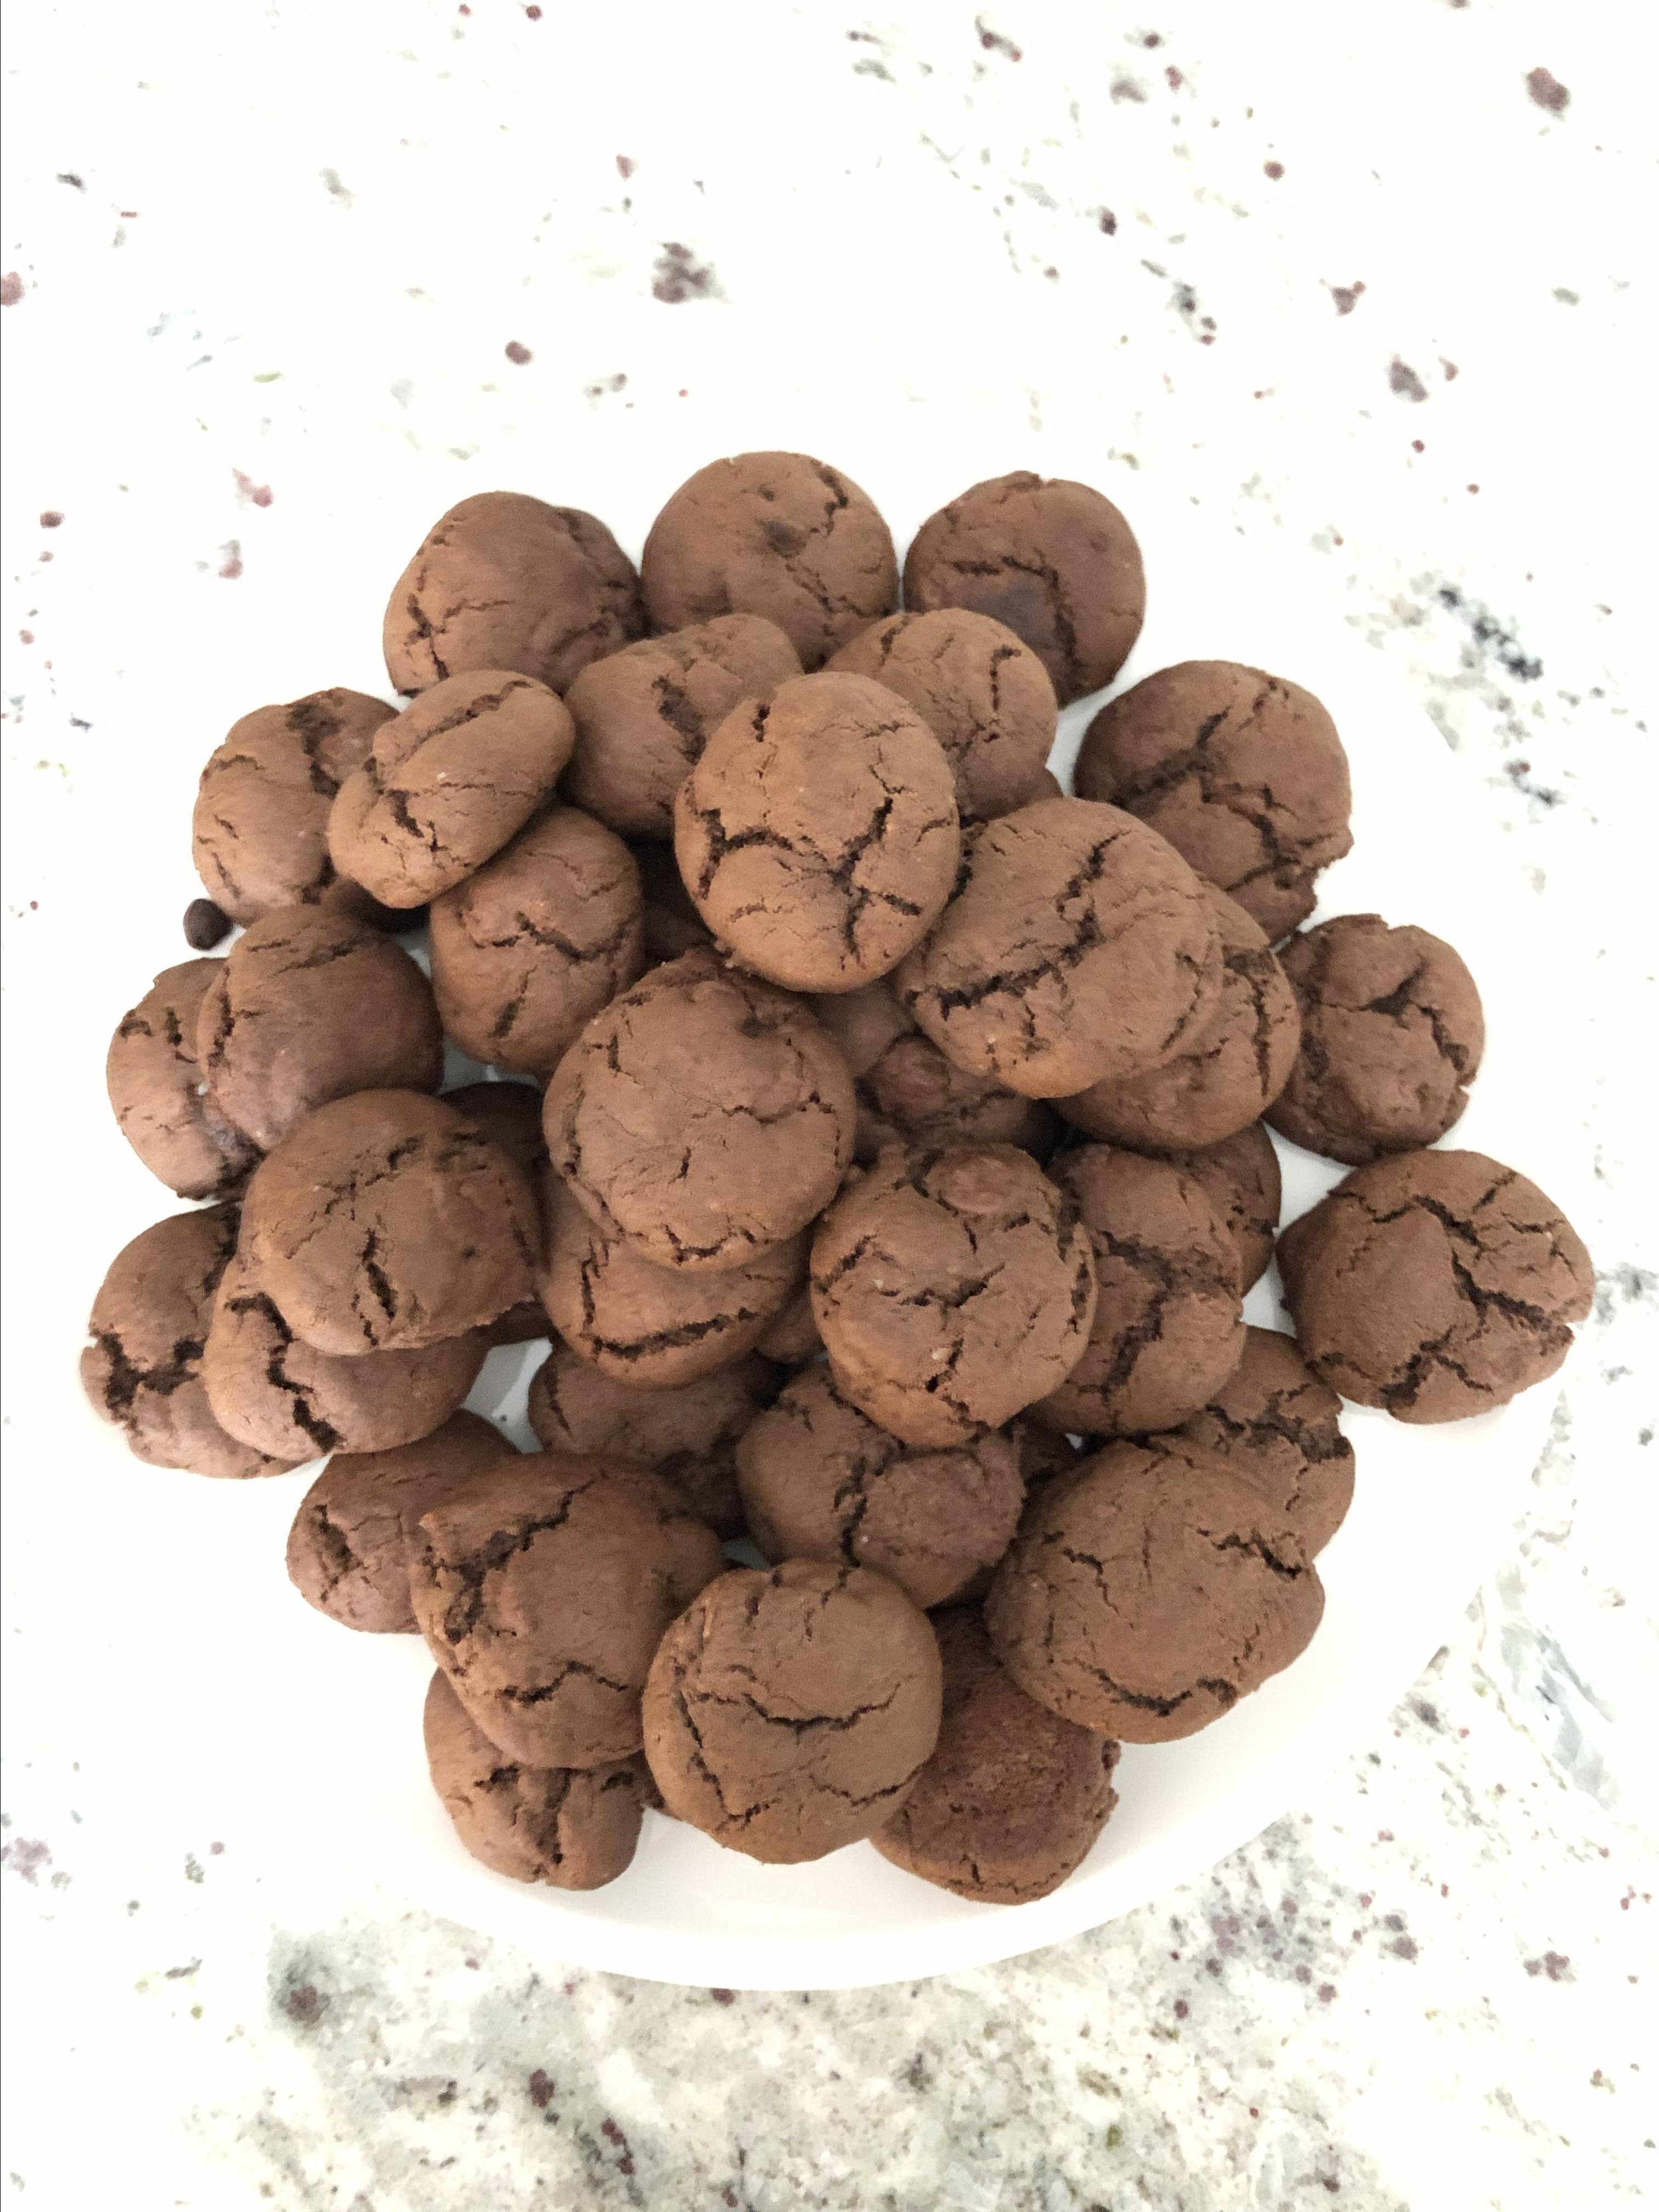 Granola-Chocolate Cookies Lucia Giancroce